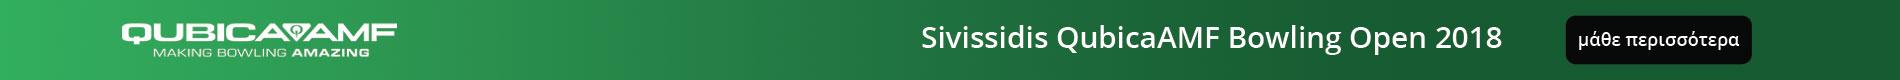 sivissidis tournament qubica amf 2018